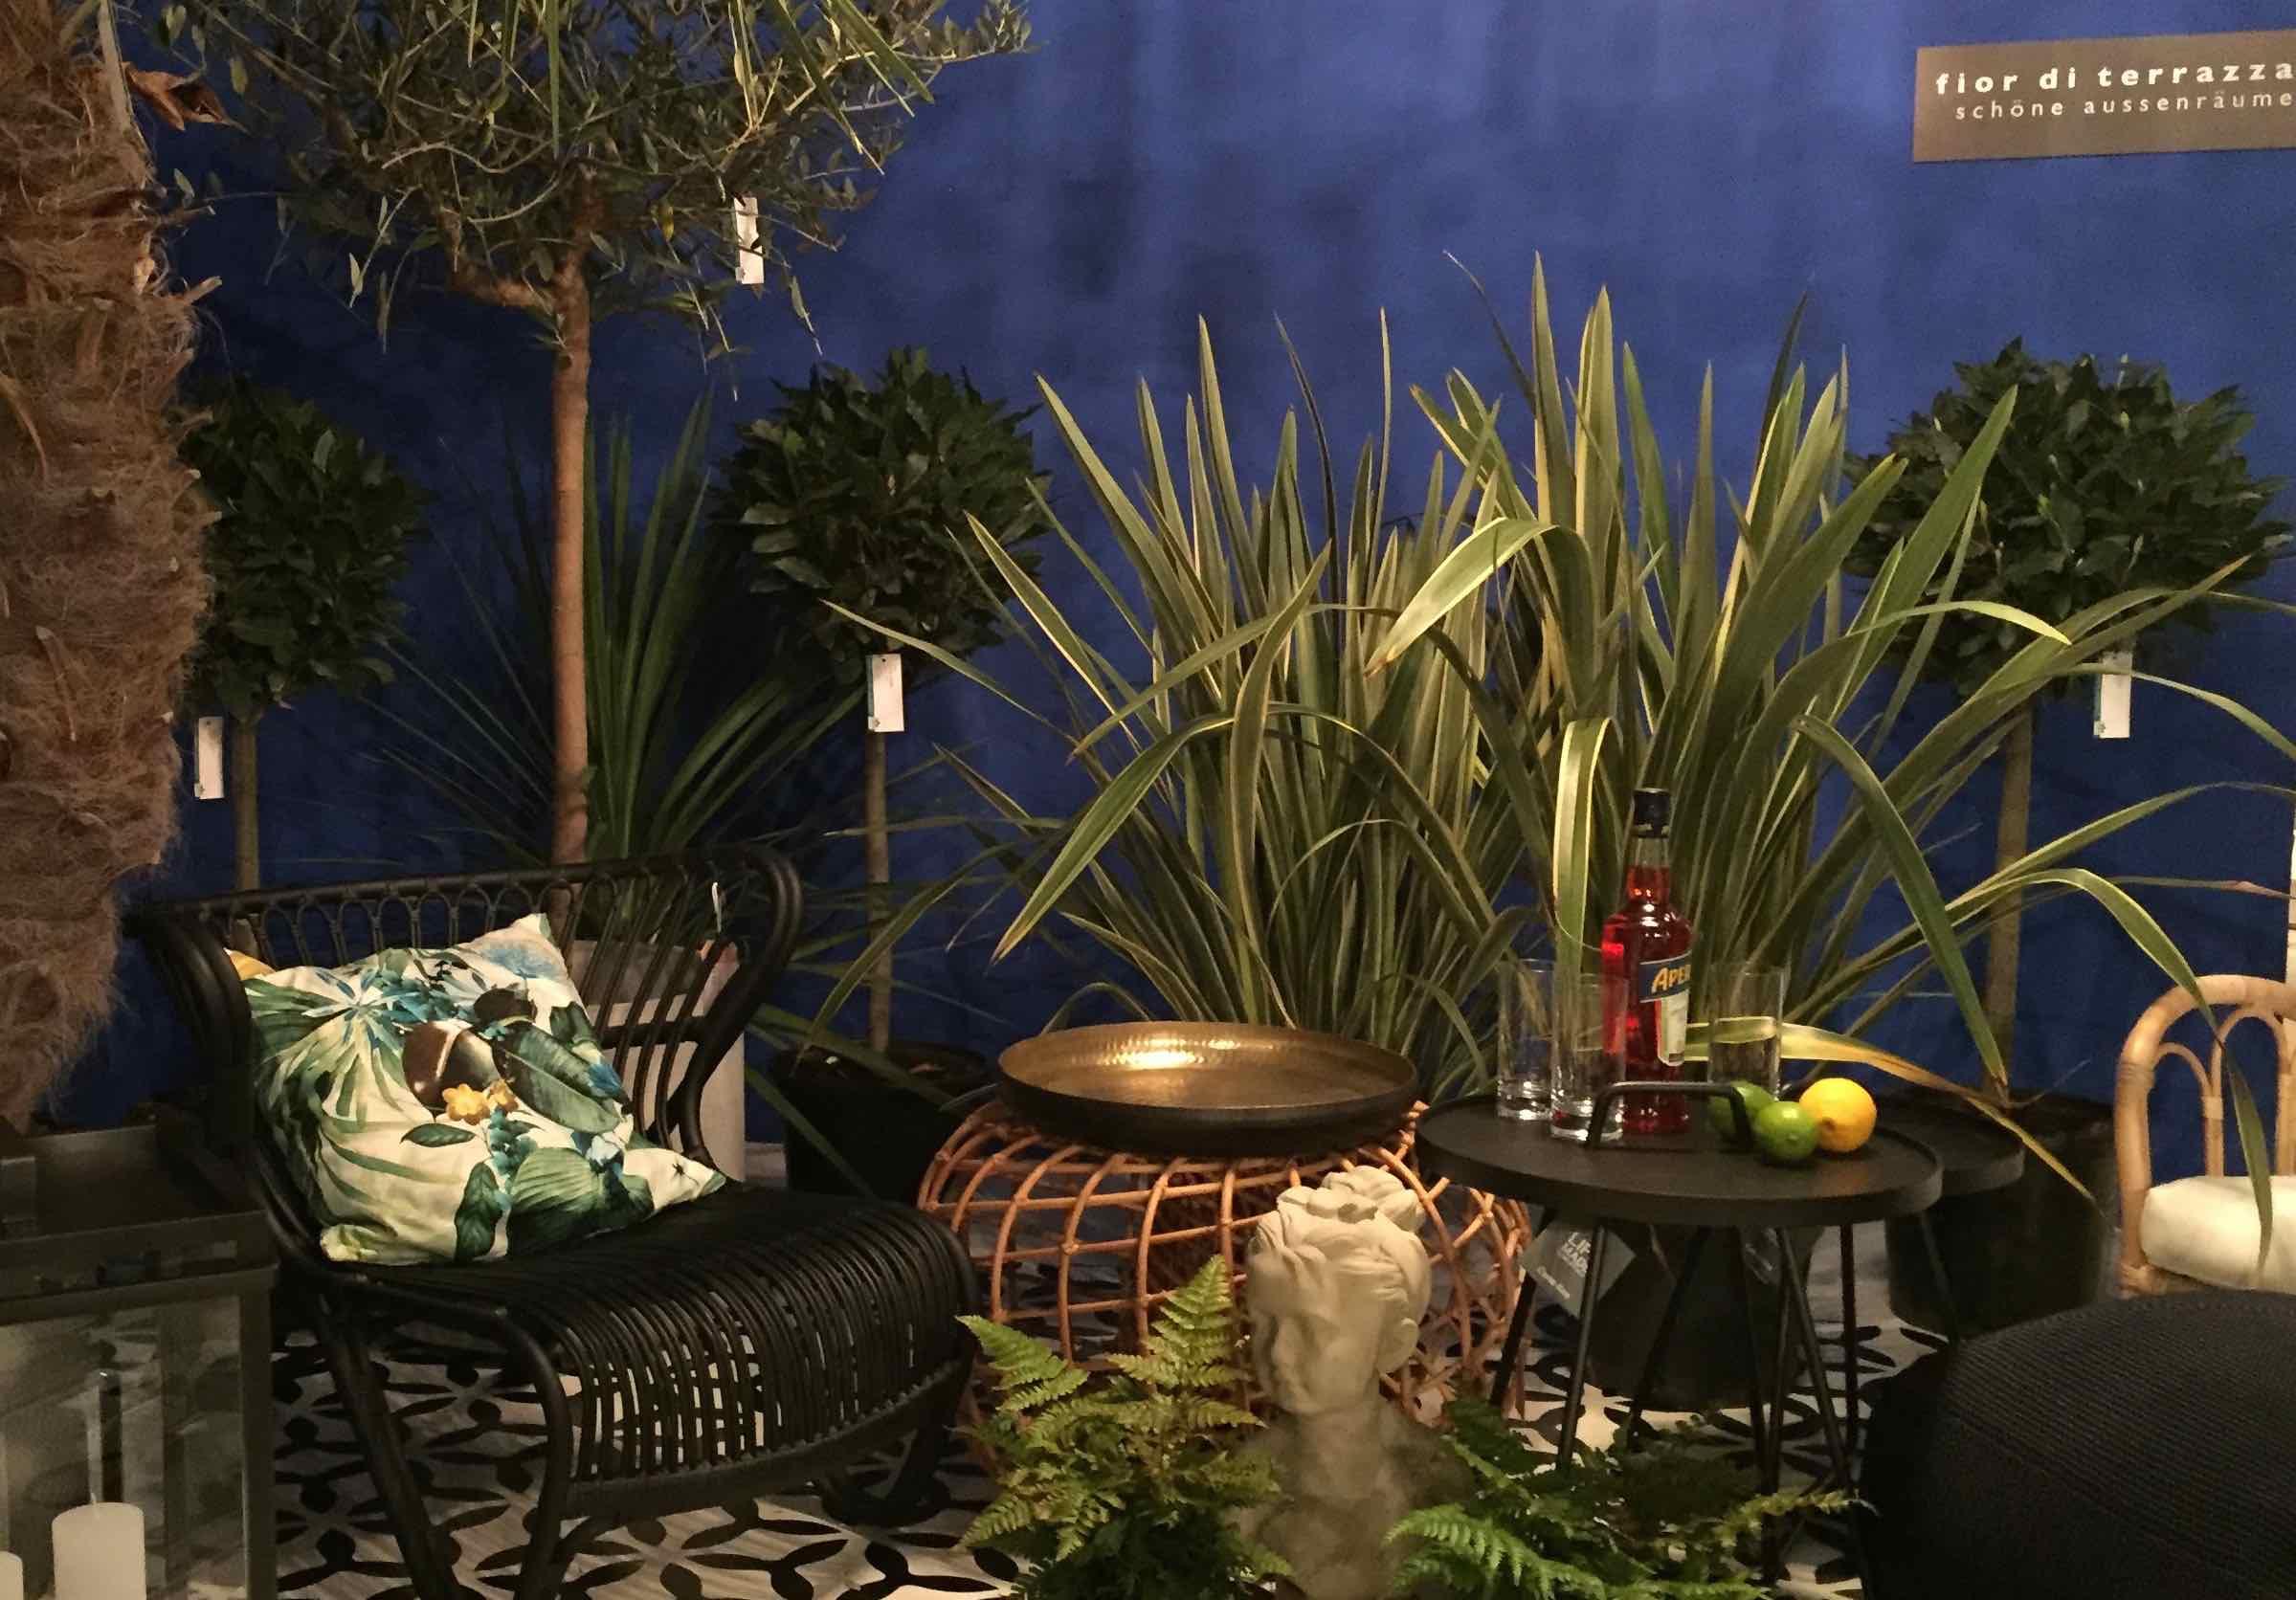 Wintergarten in Ultramarineblau, verglast